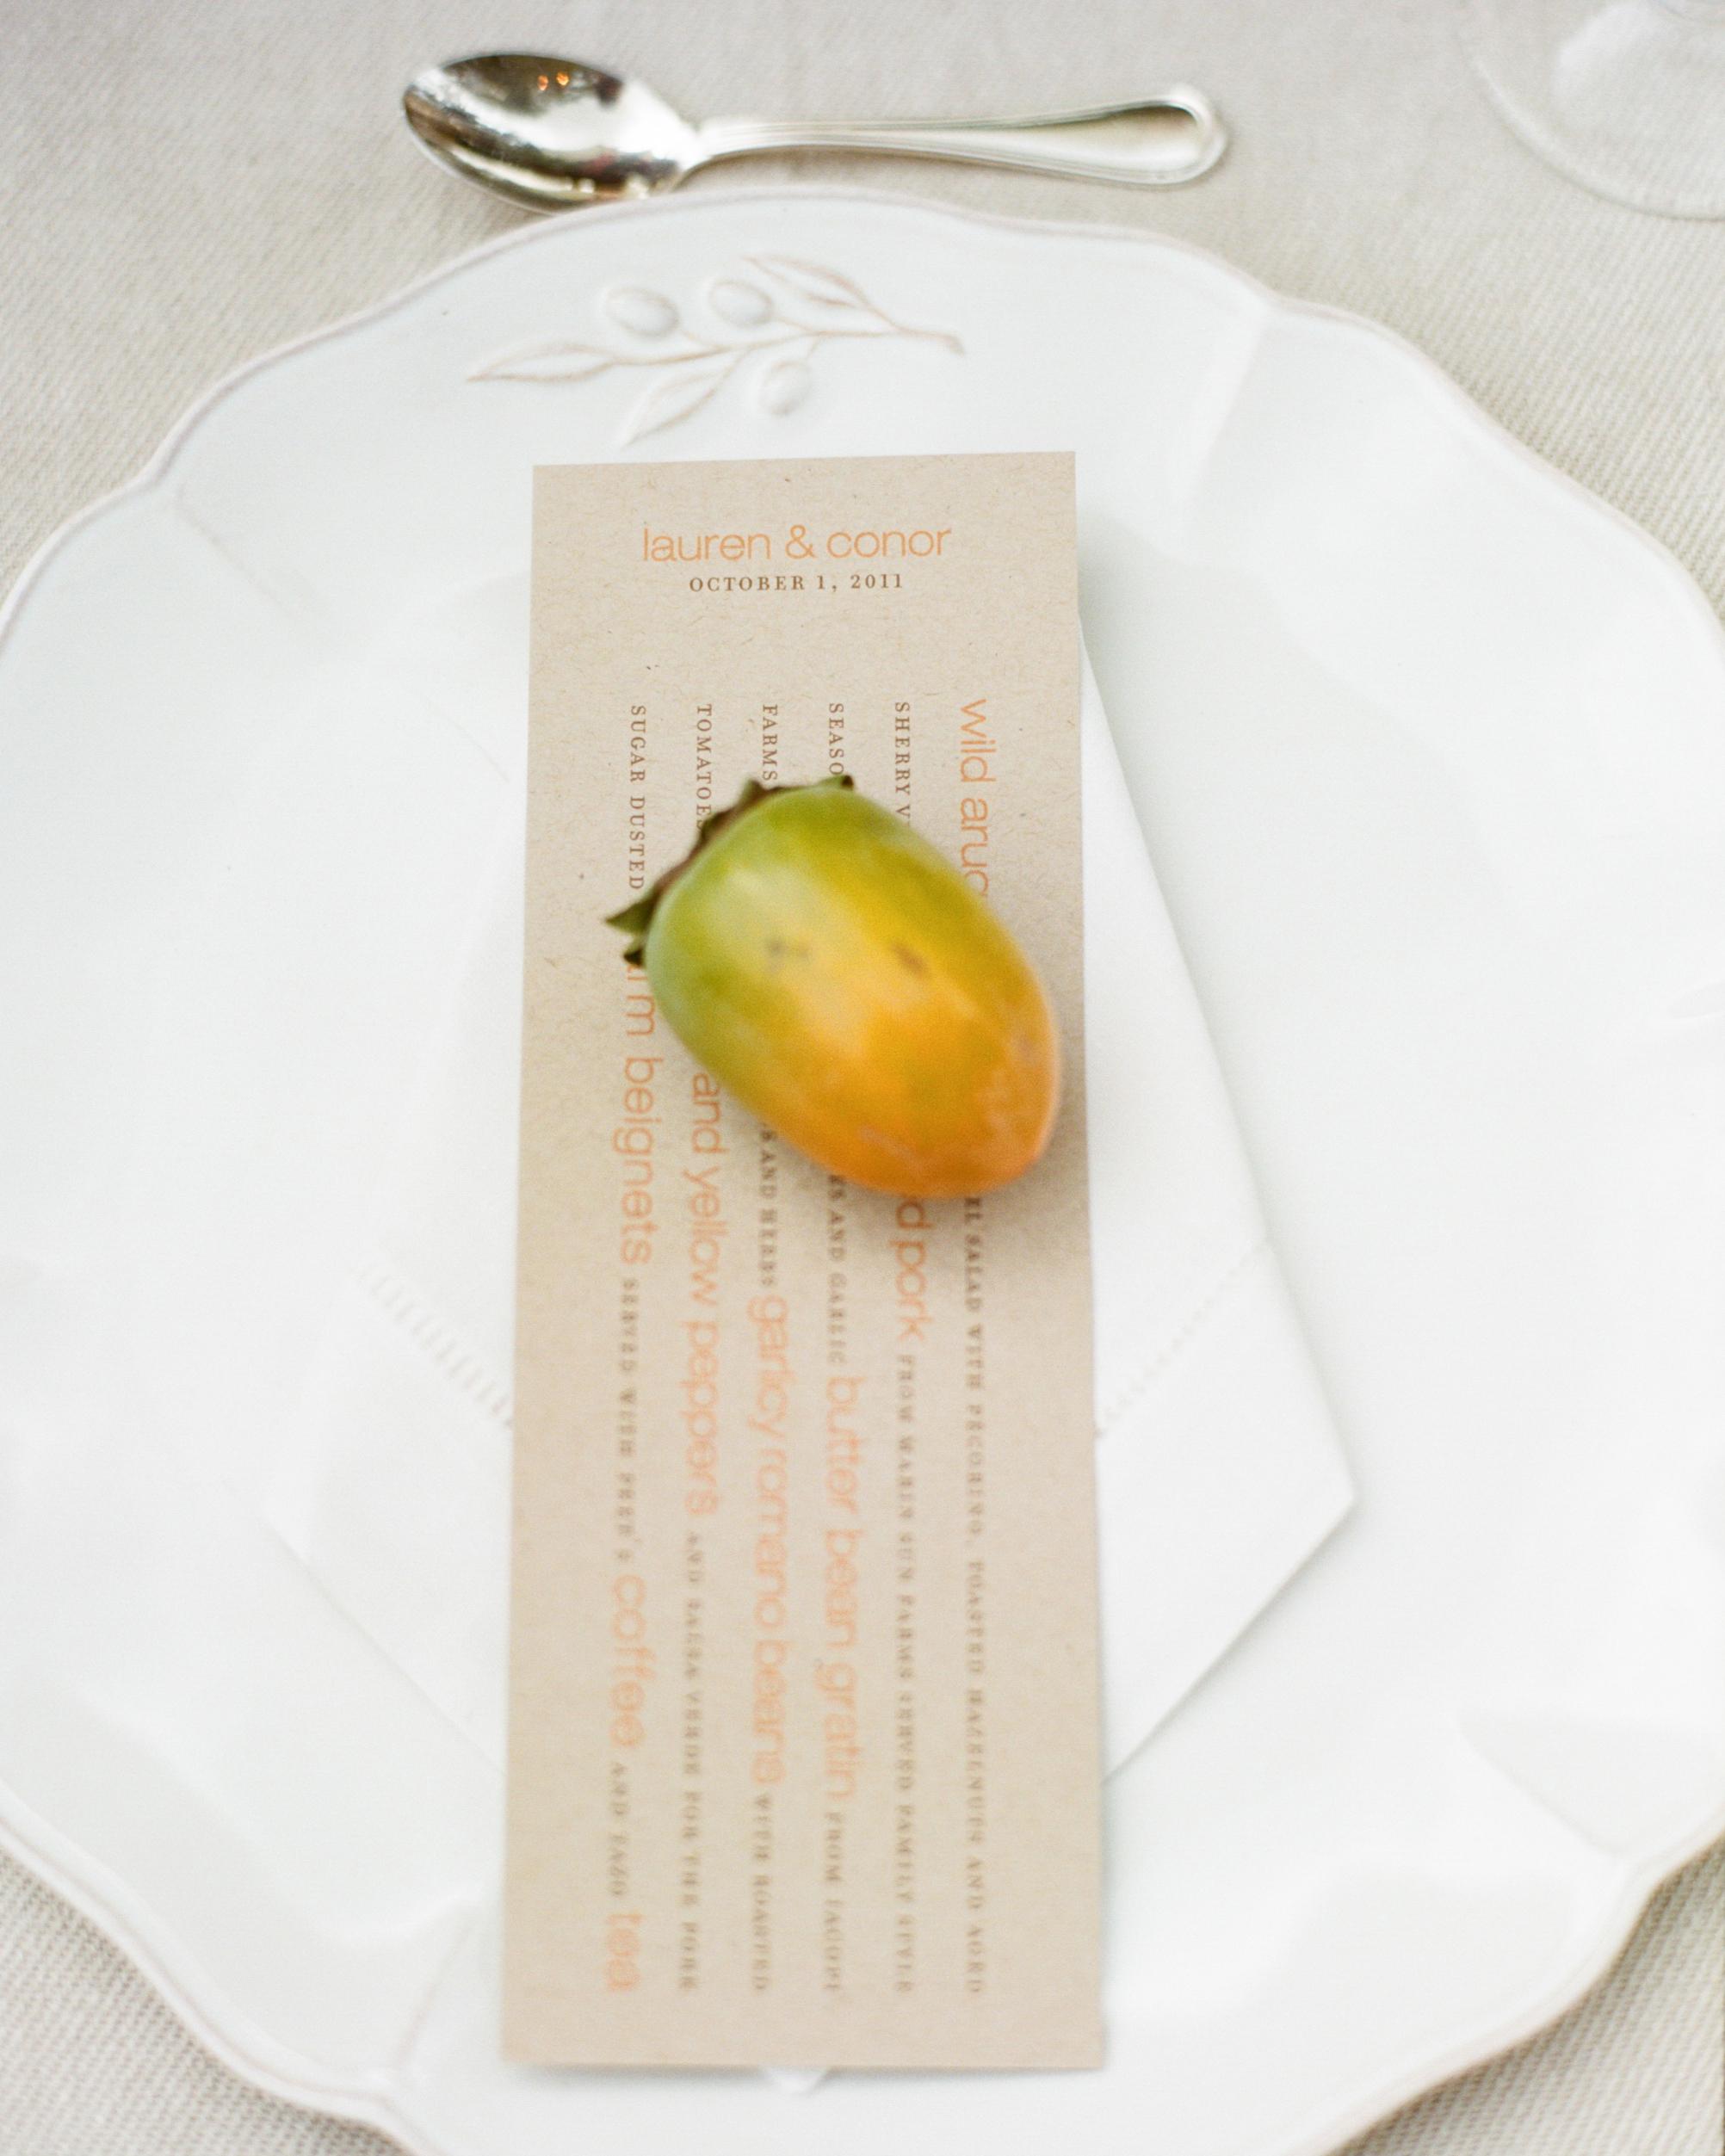 laura-connor-menu-0735-74300003-wds109822.jpg